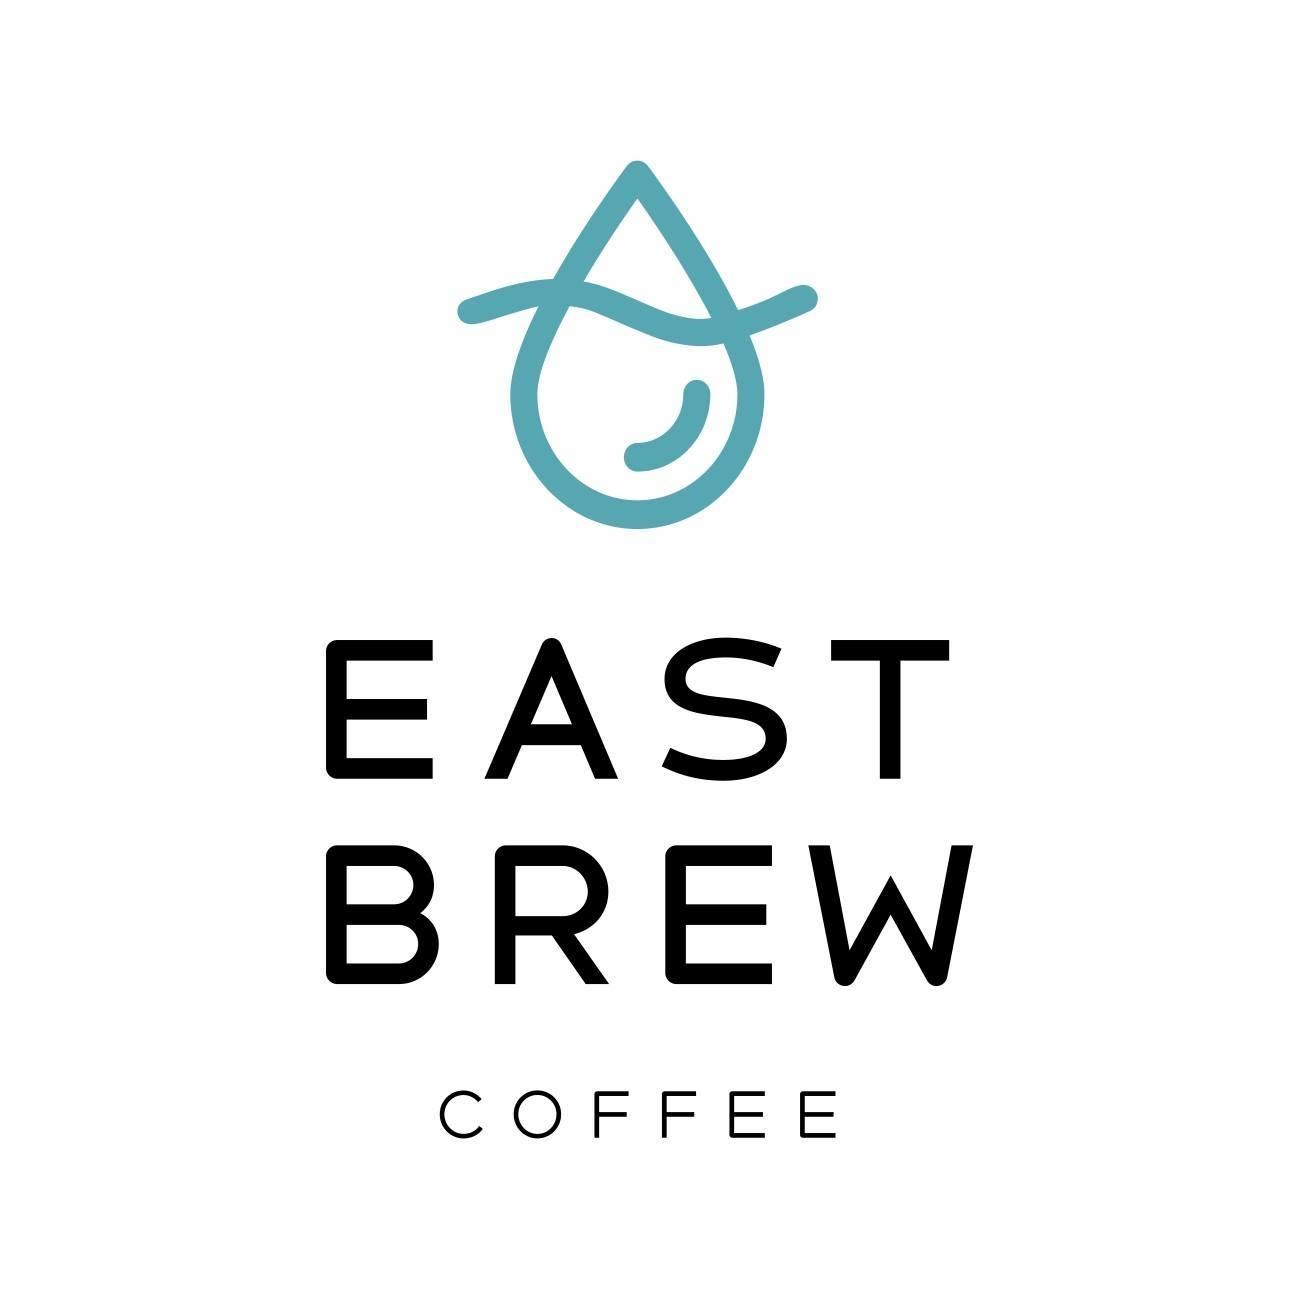 Eastbrew Coffee logo